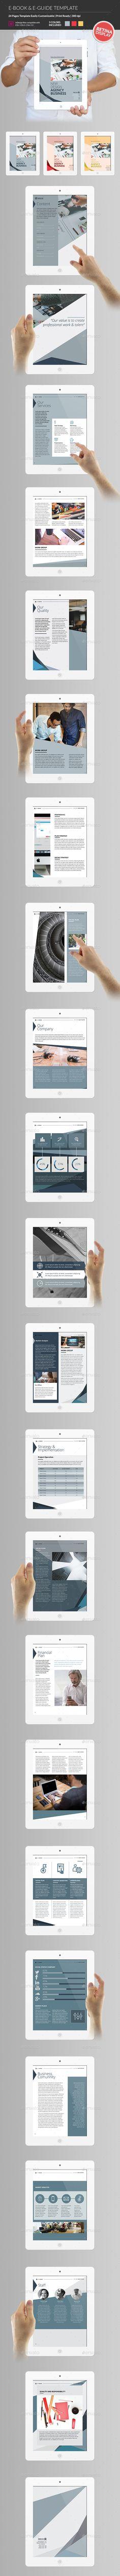 Corporate E-Book & E-Brochure Template InDesign INDD. Download here: https://graphicriver.net/item/corporate-ebook-ebrochure/16989920?ref=ksioks